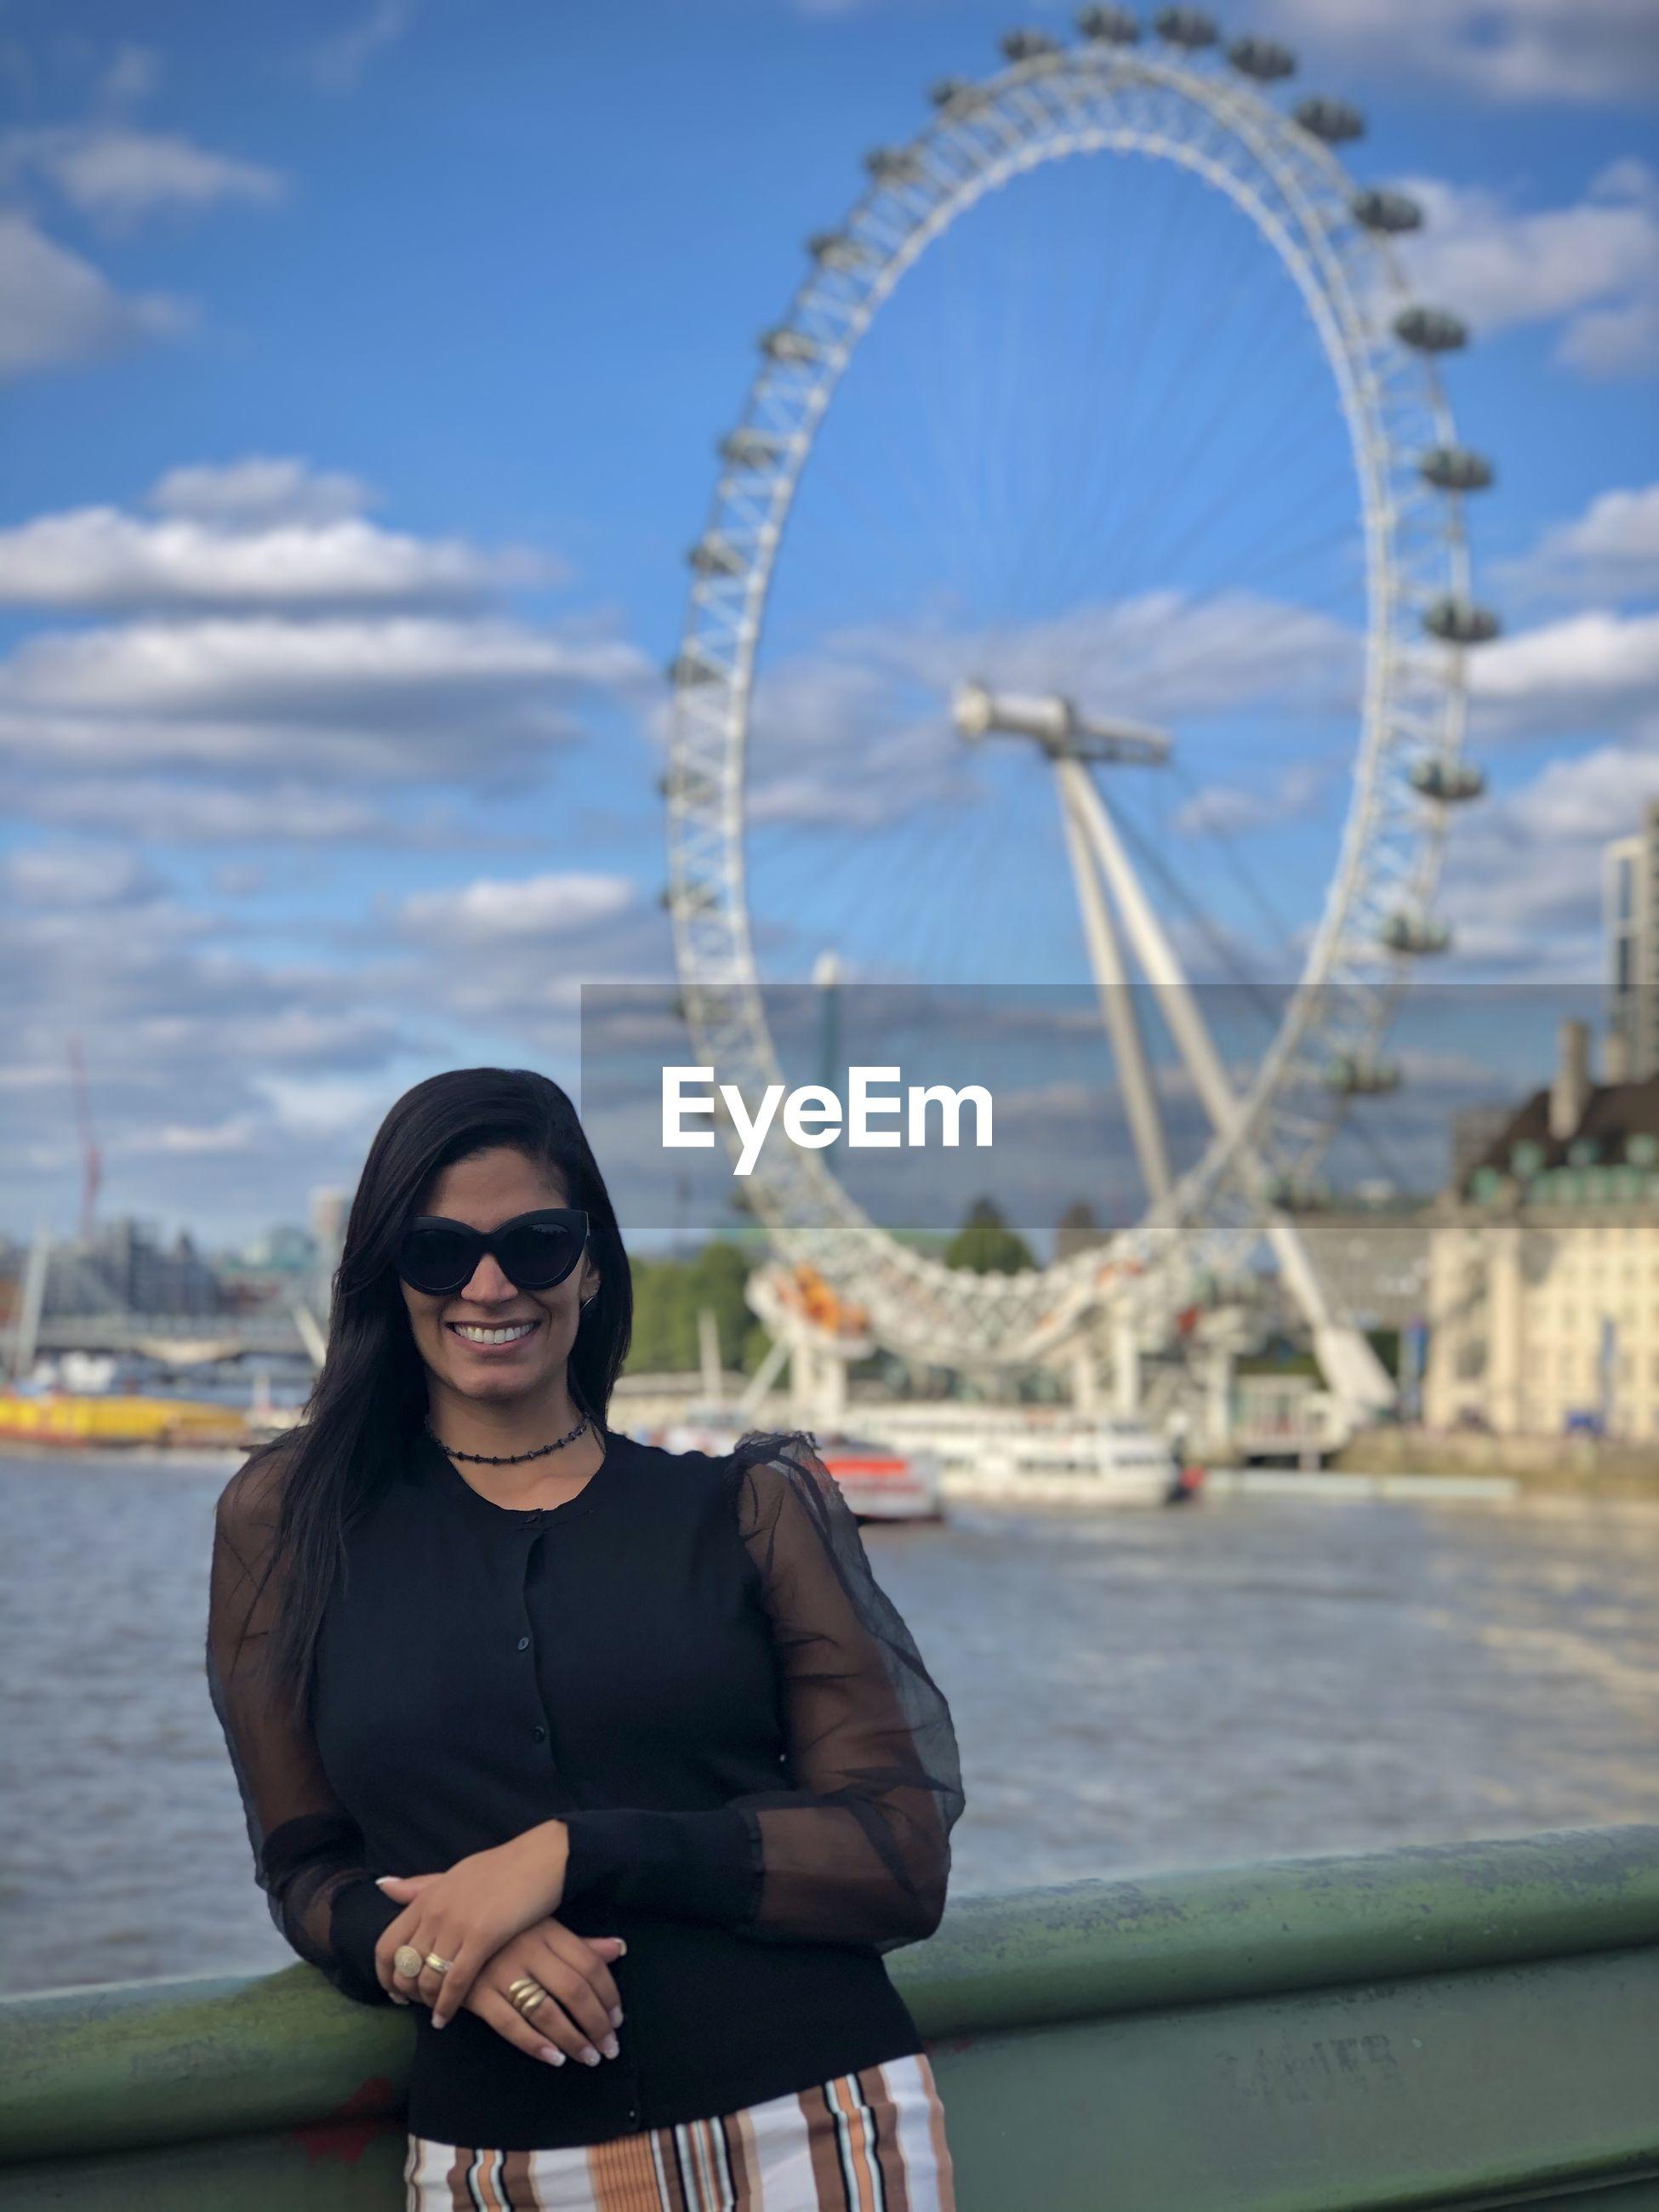 Portrait of woman wearing sunglasses against ferris wheel by river in city